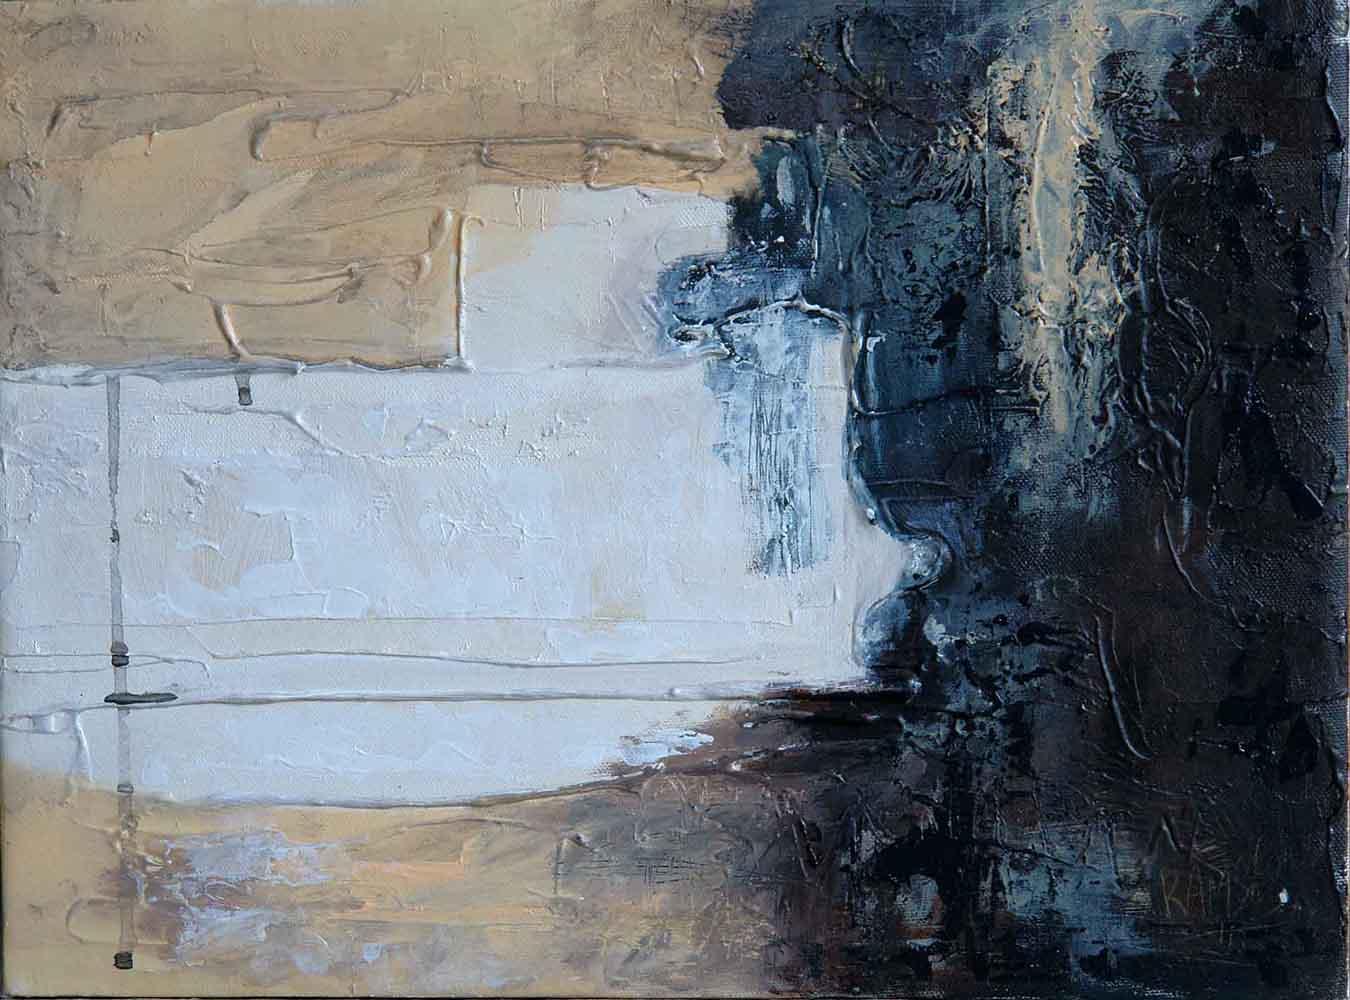 Abstract010 Ramses Morales